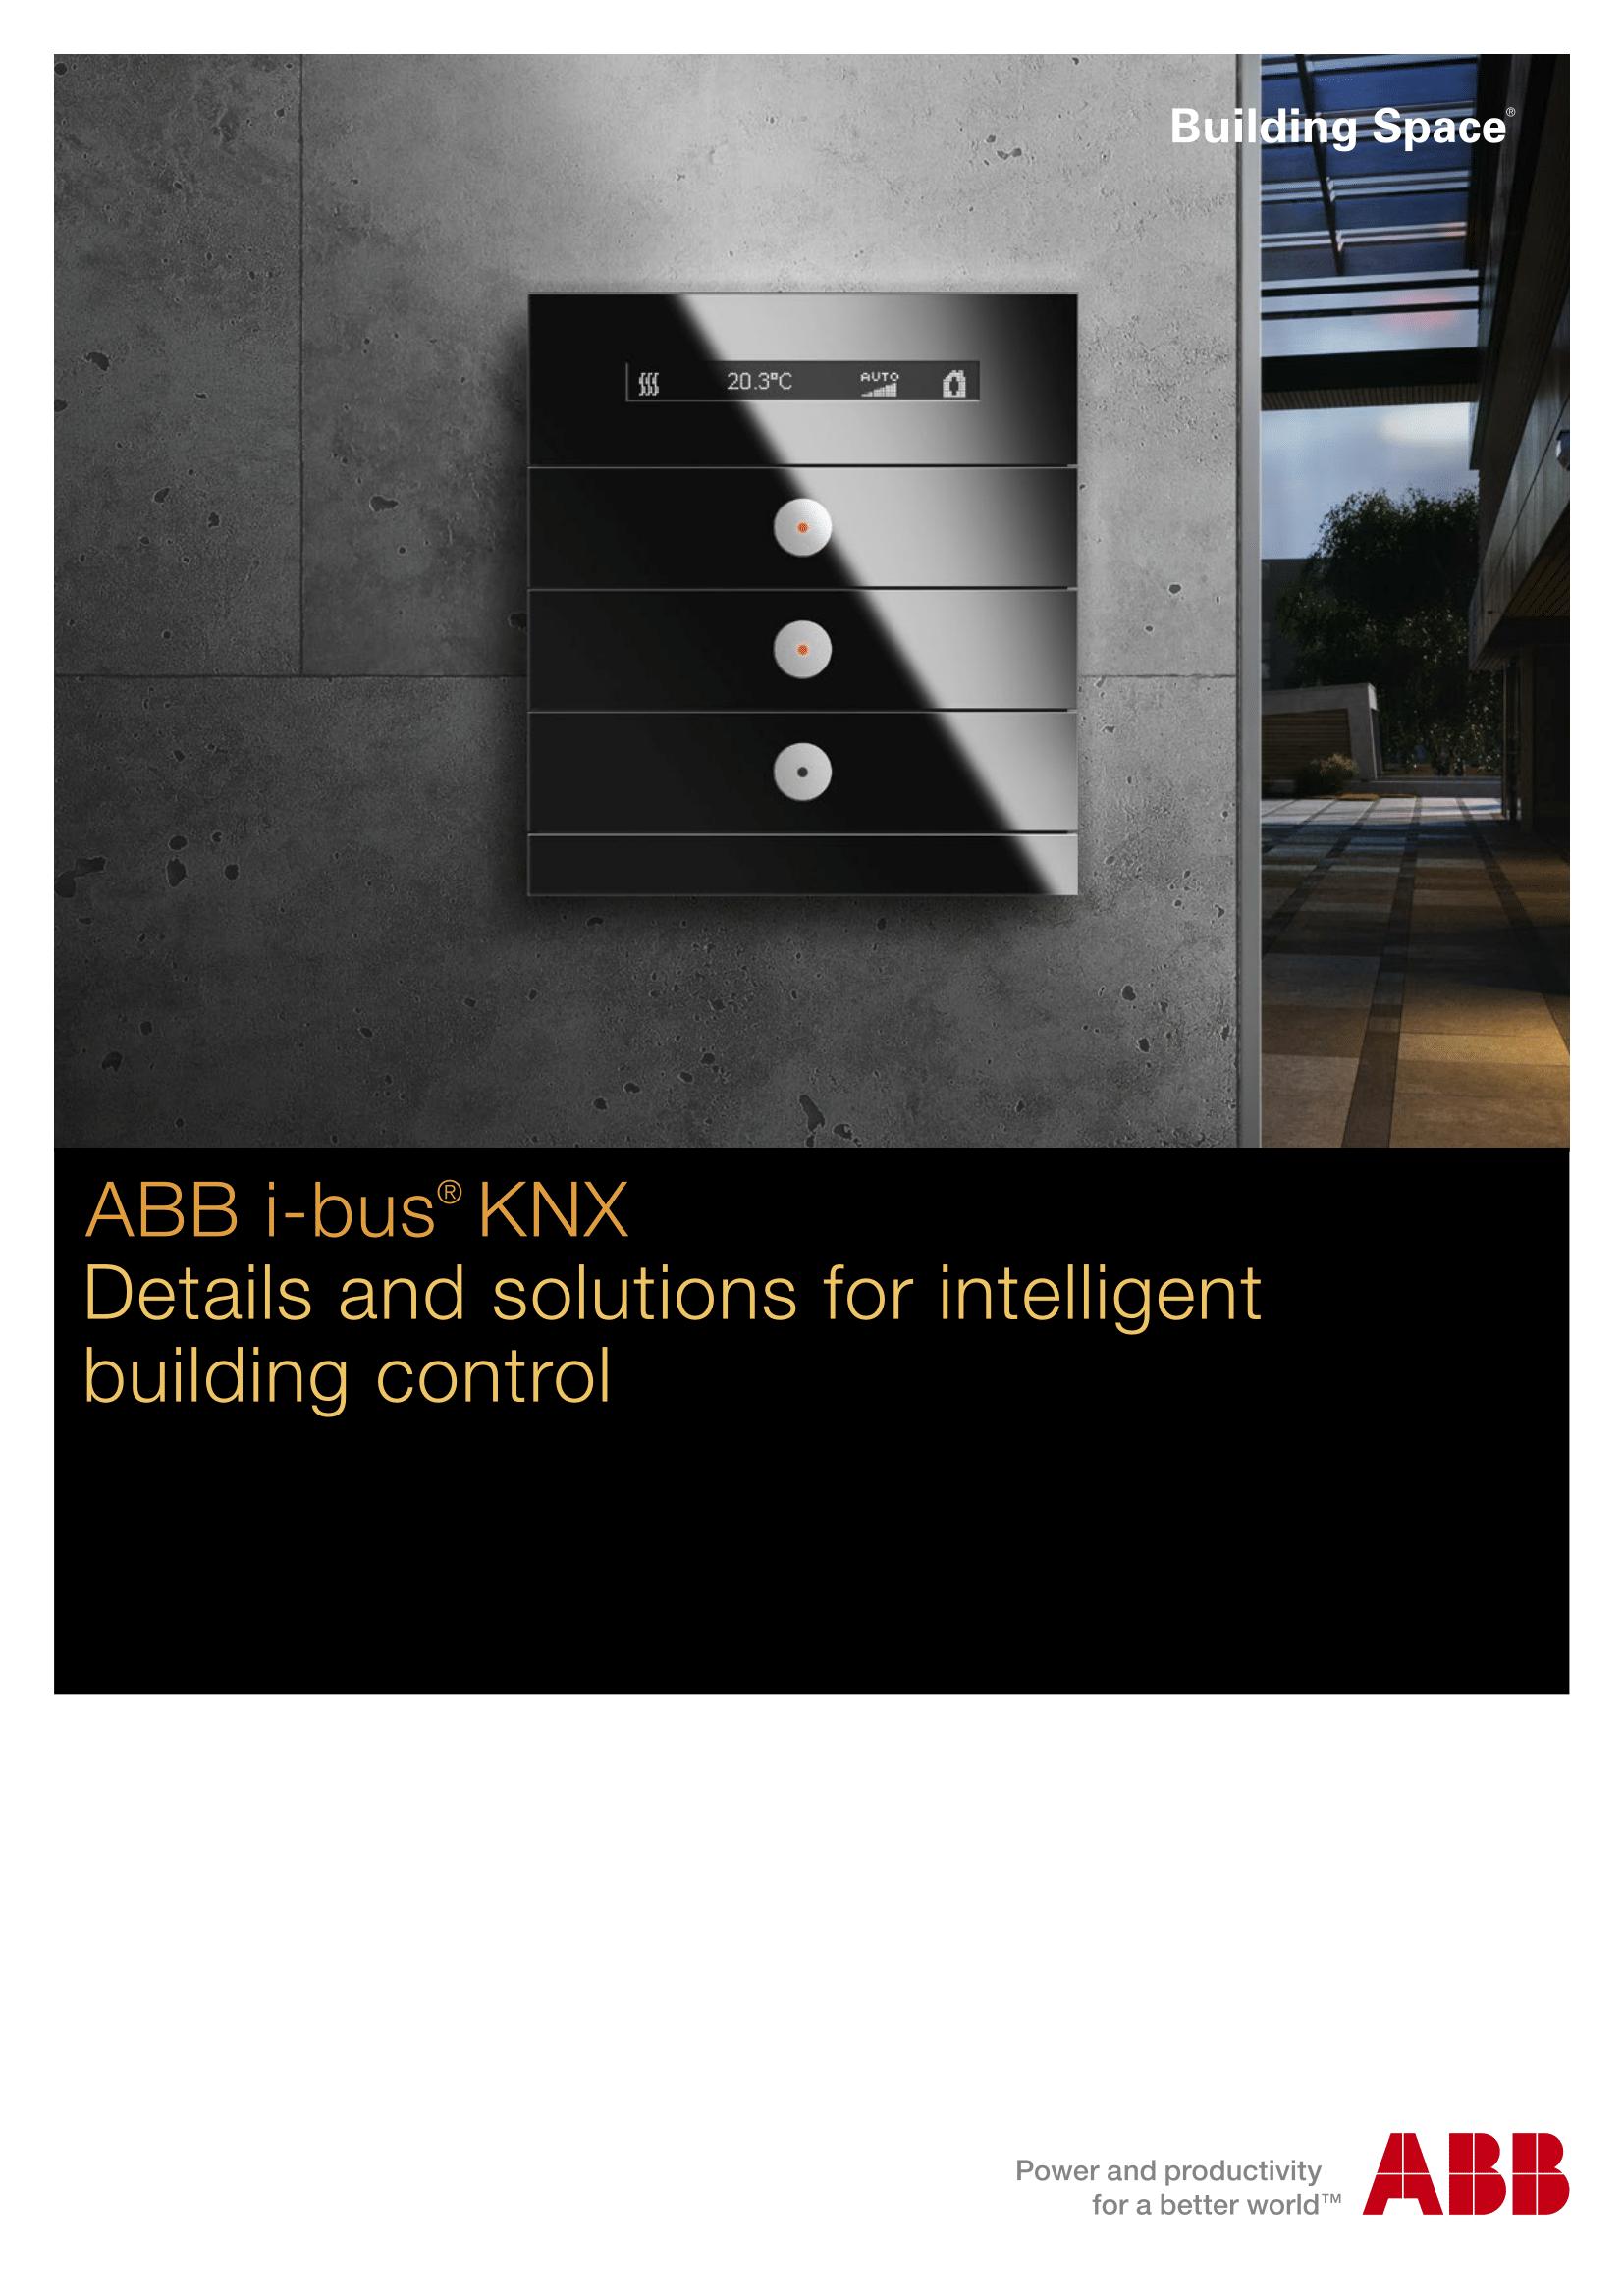 ABB KNX Sensor Brochure